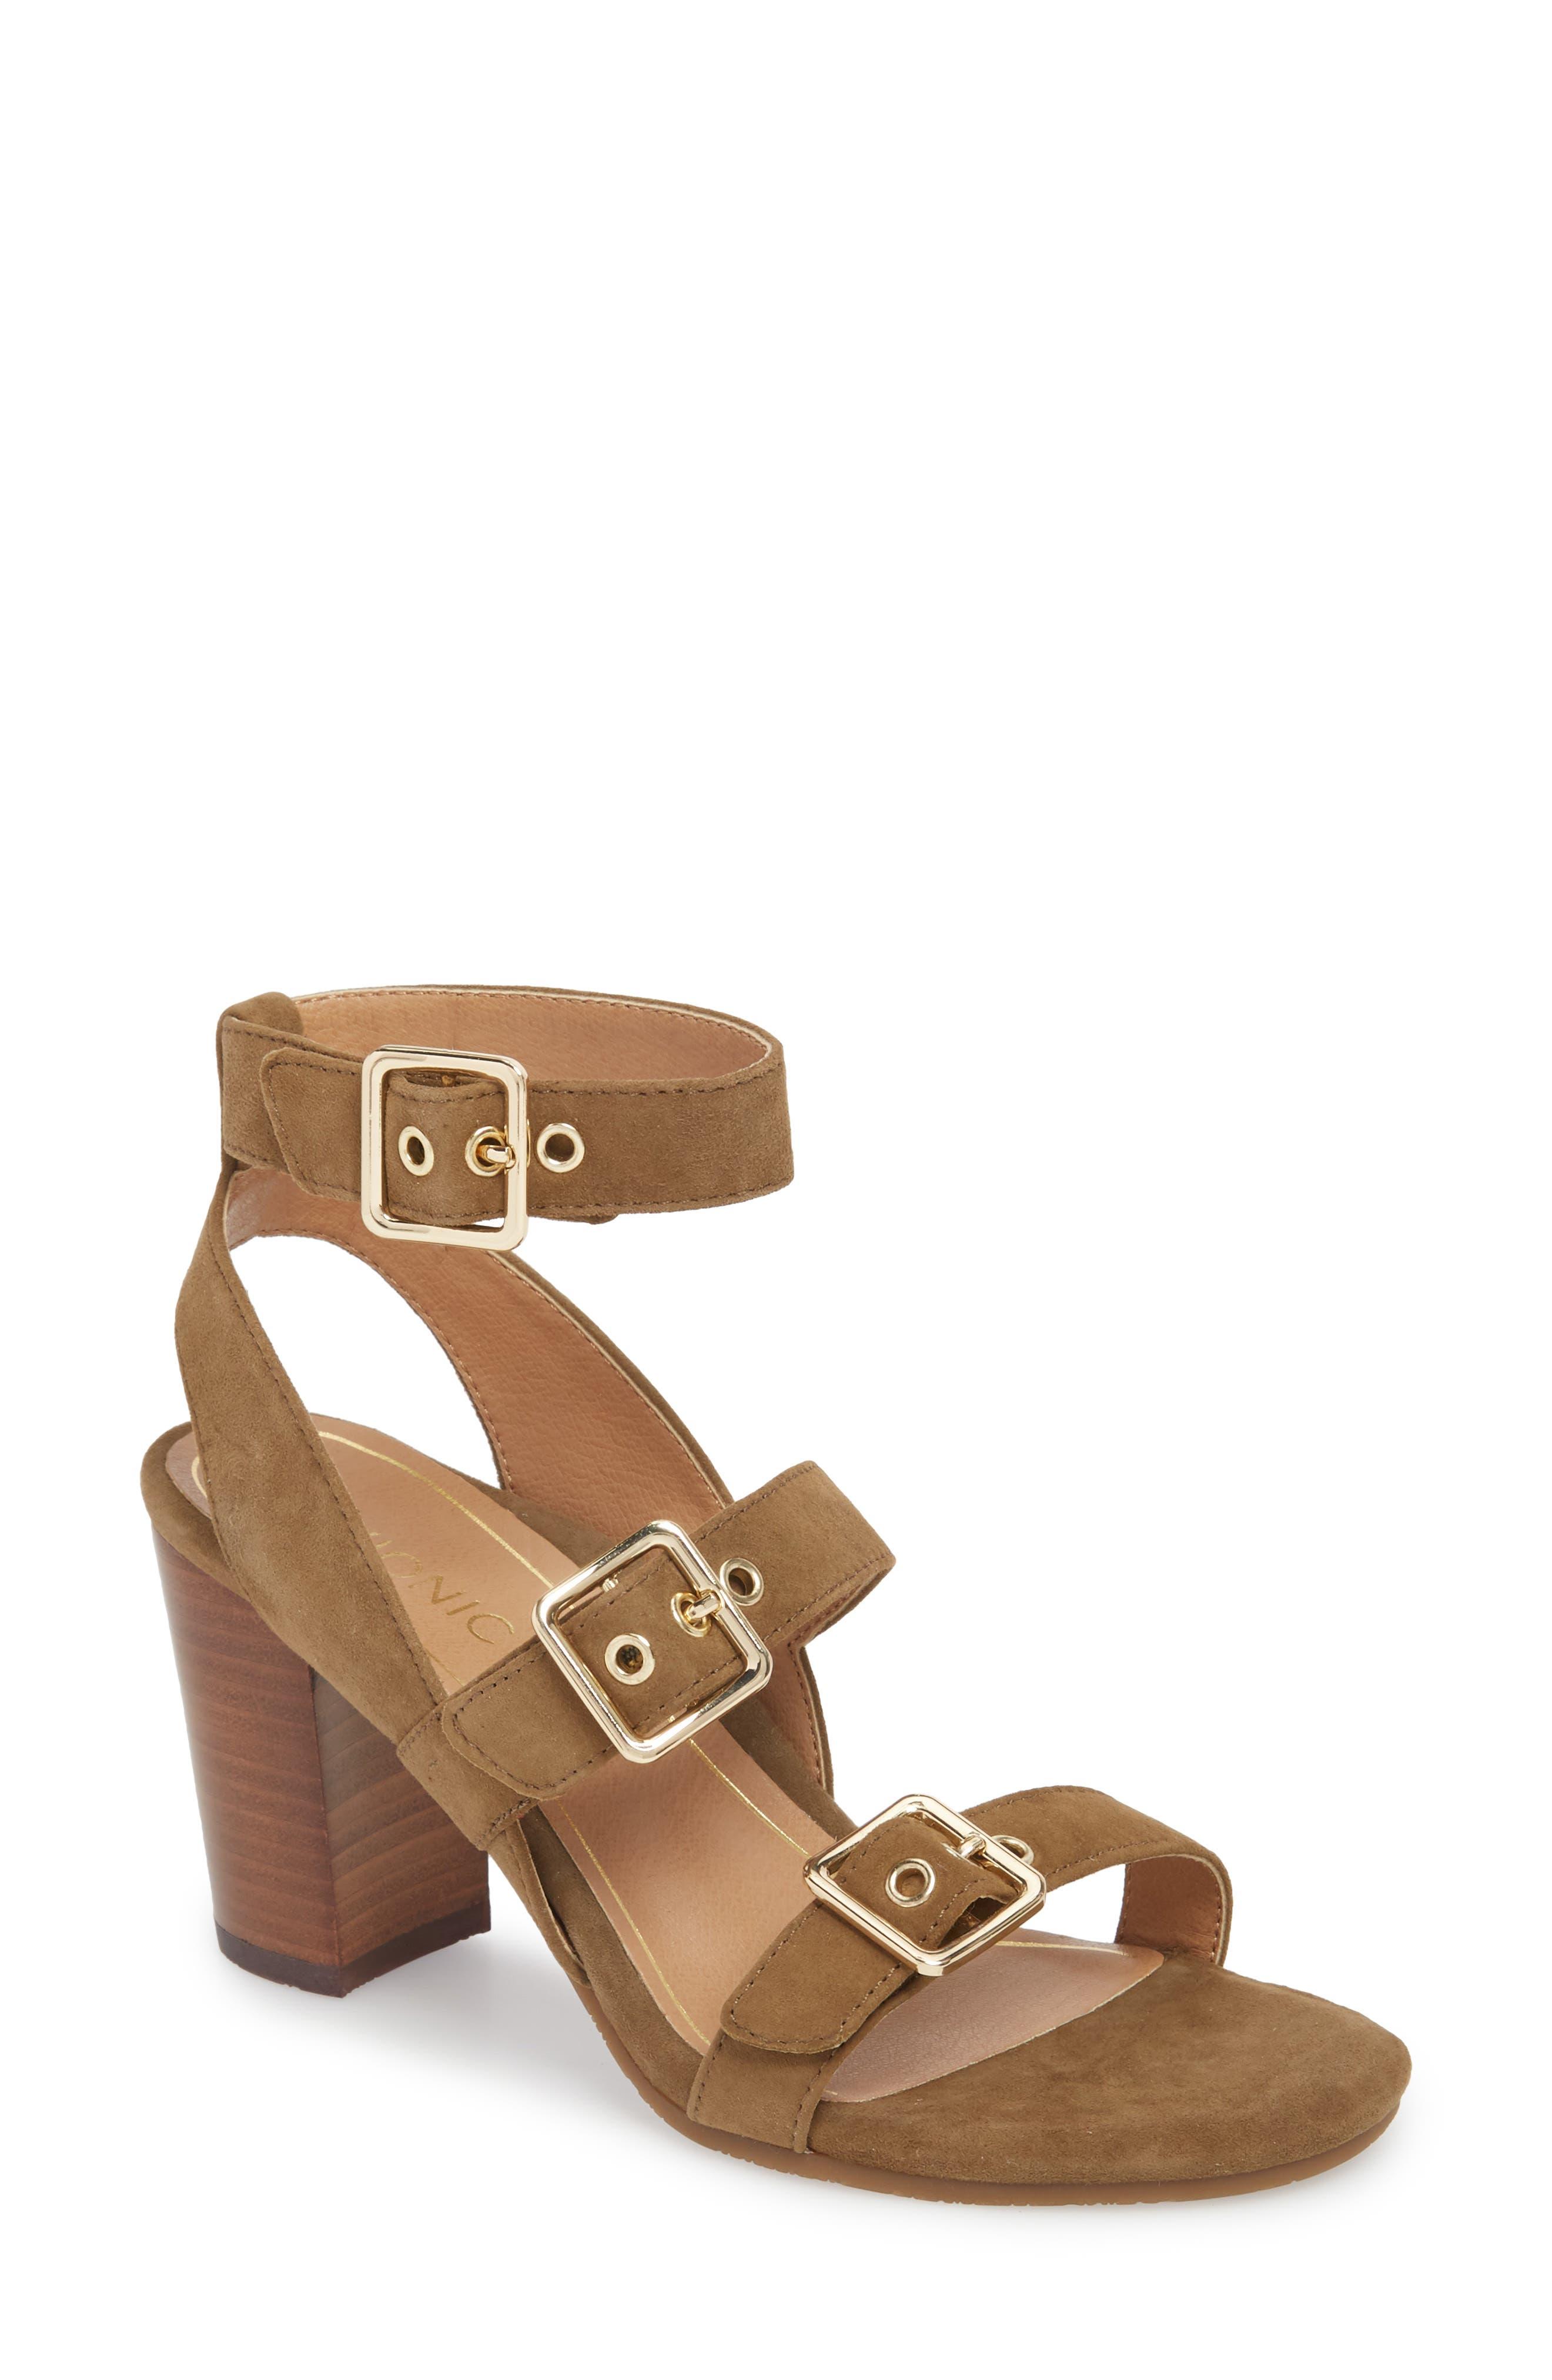 Carmel Block Heel Sandal,                         Main,                         color, 310